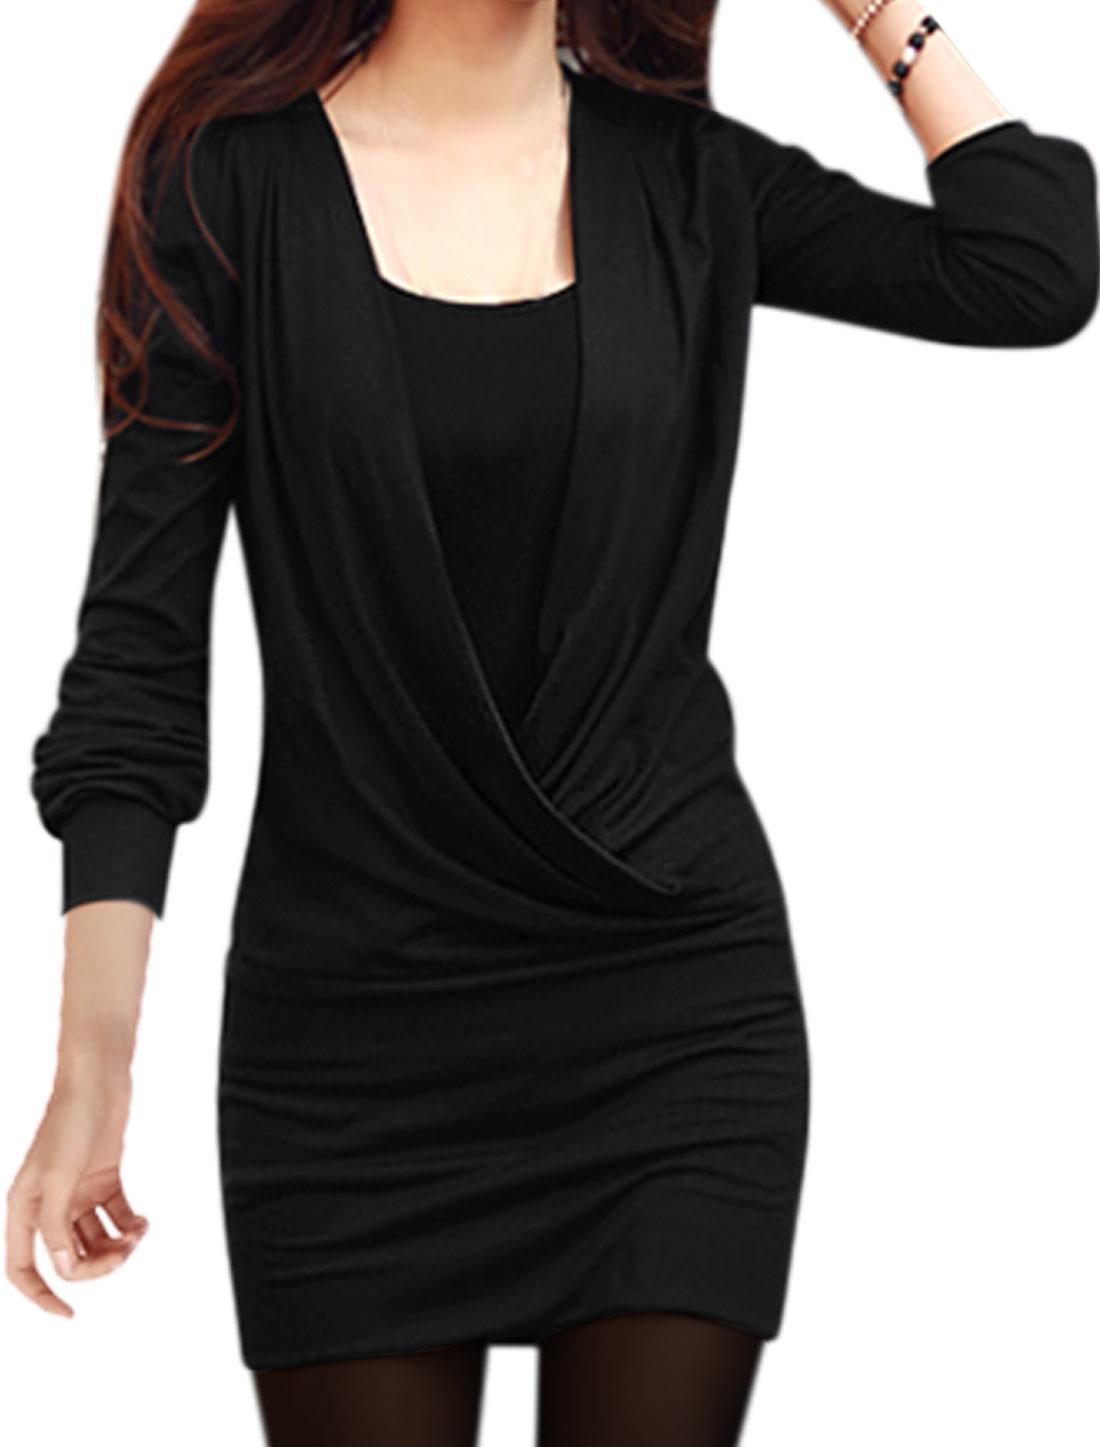 WWomen Wrap Design Tunic Top w Slim Fit Cami Sets Black S